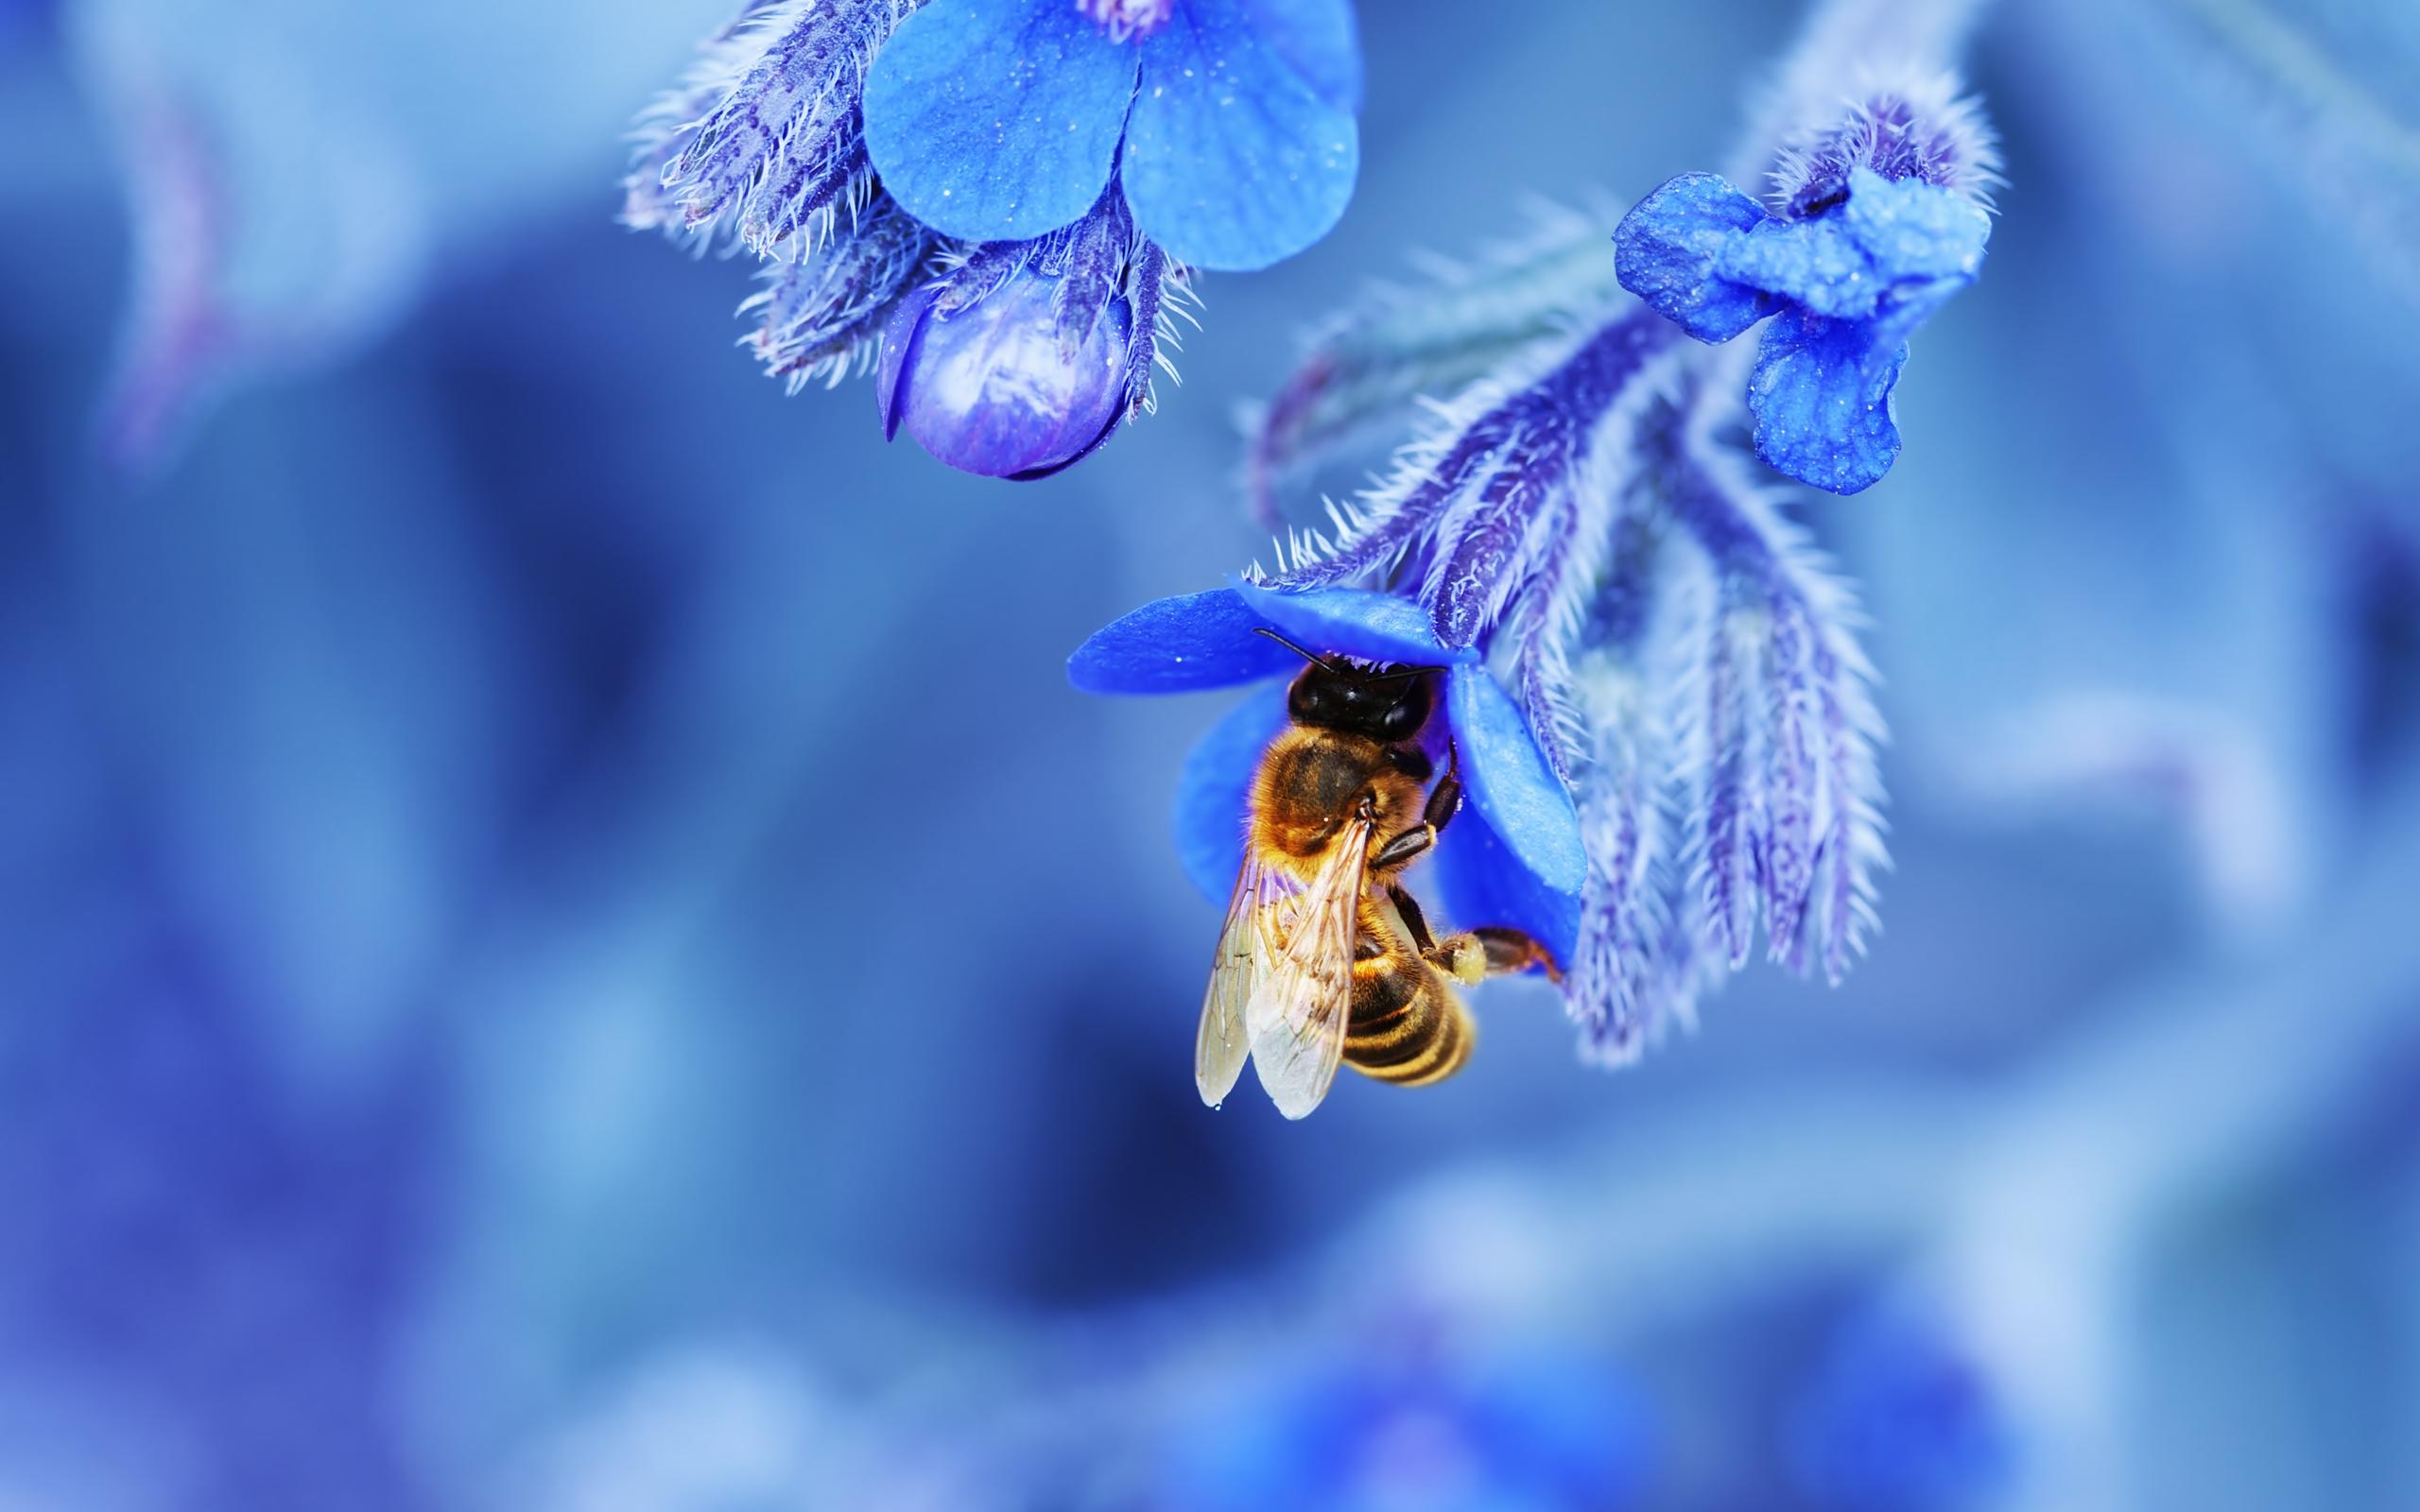 Bee Wallpaper HD Freetopwallpapercom 2560x1600